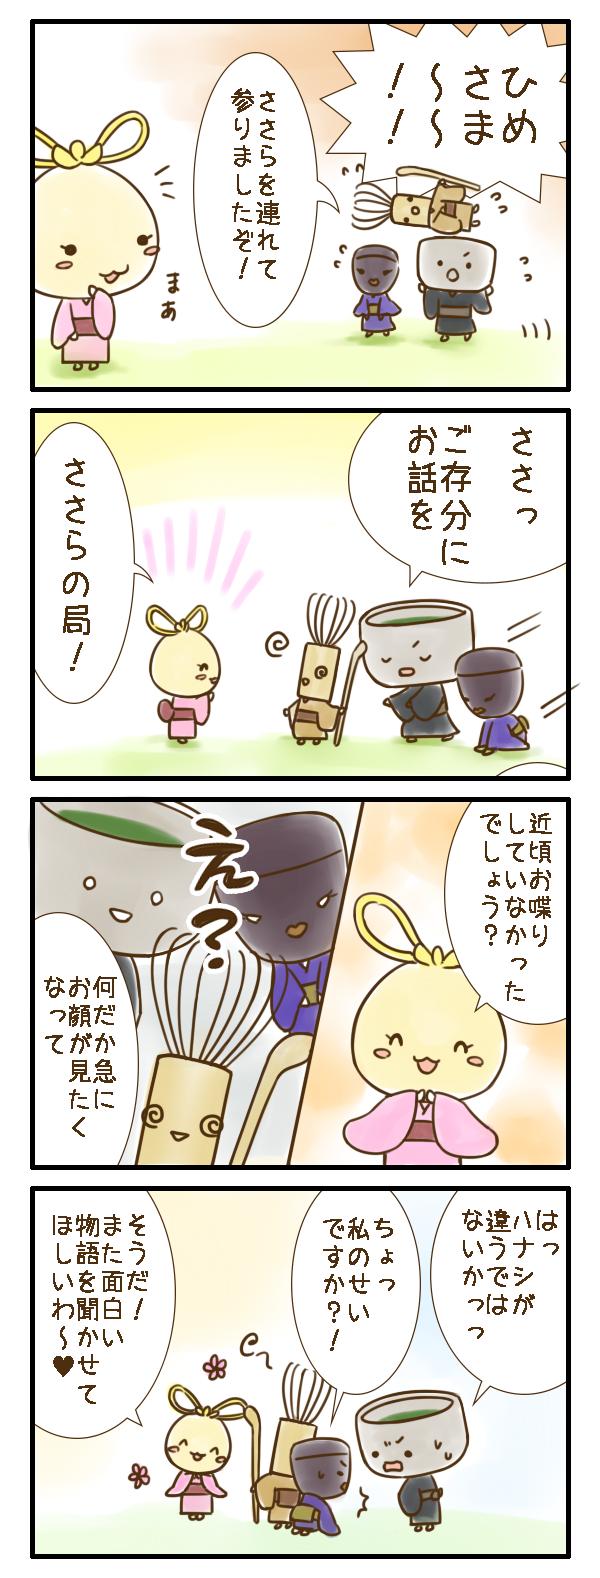 himeyobi03